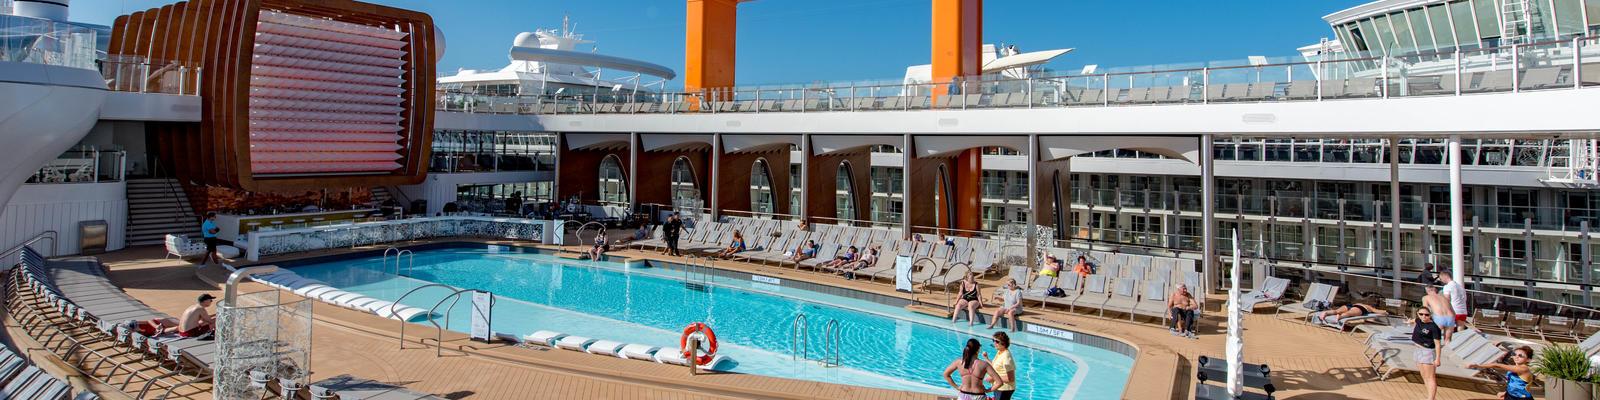 The main pool on Celebrity Edge (Photo: Cruise Critic)